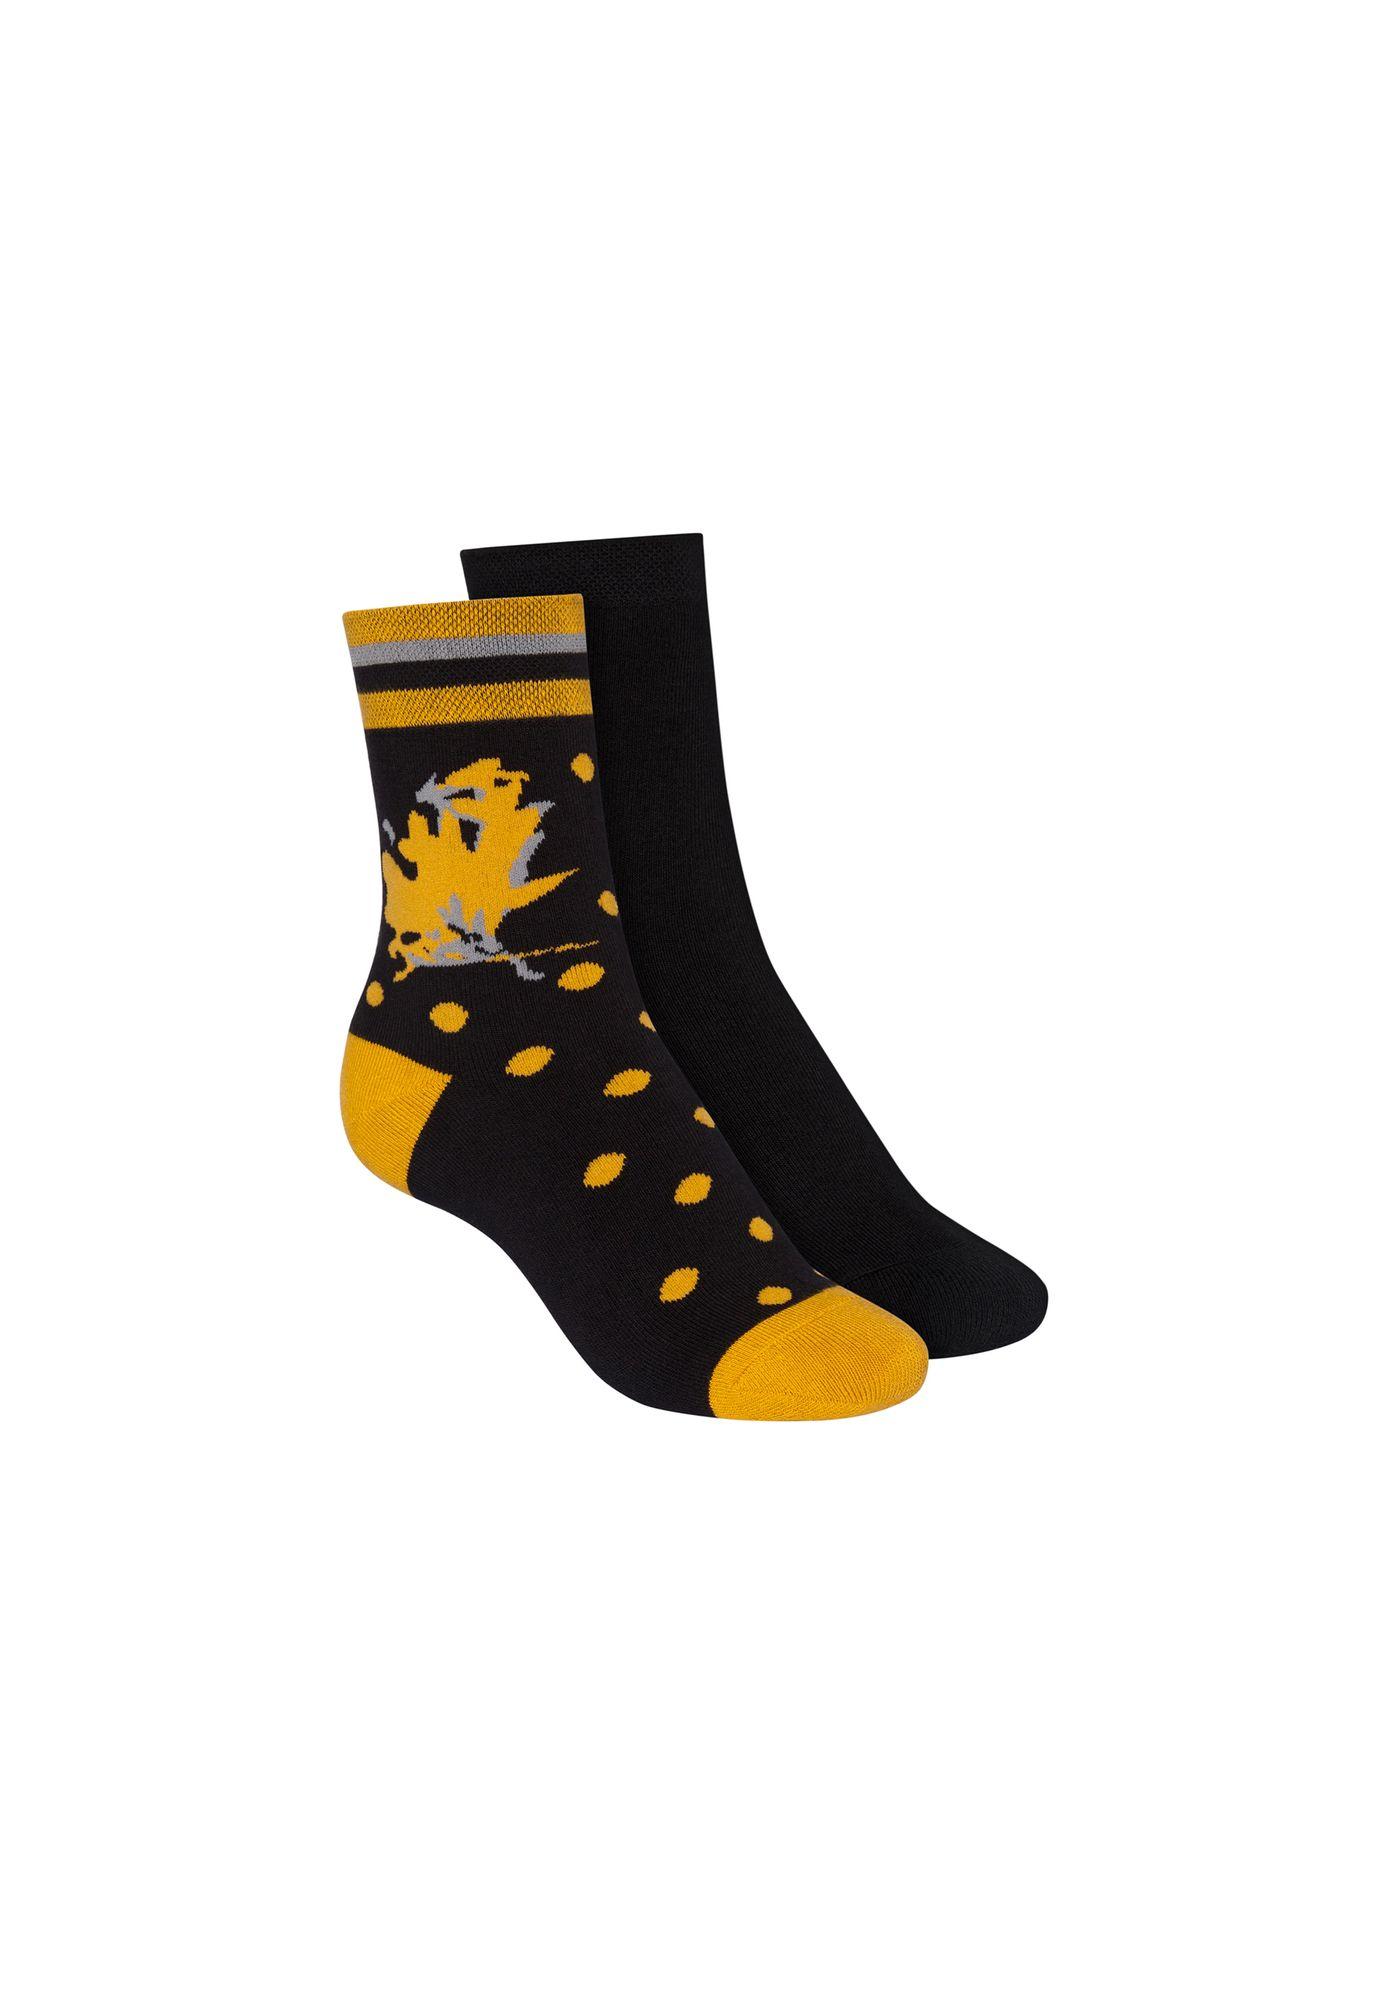 2 Pack Terry Mid Socks Black/Indian Summer Black